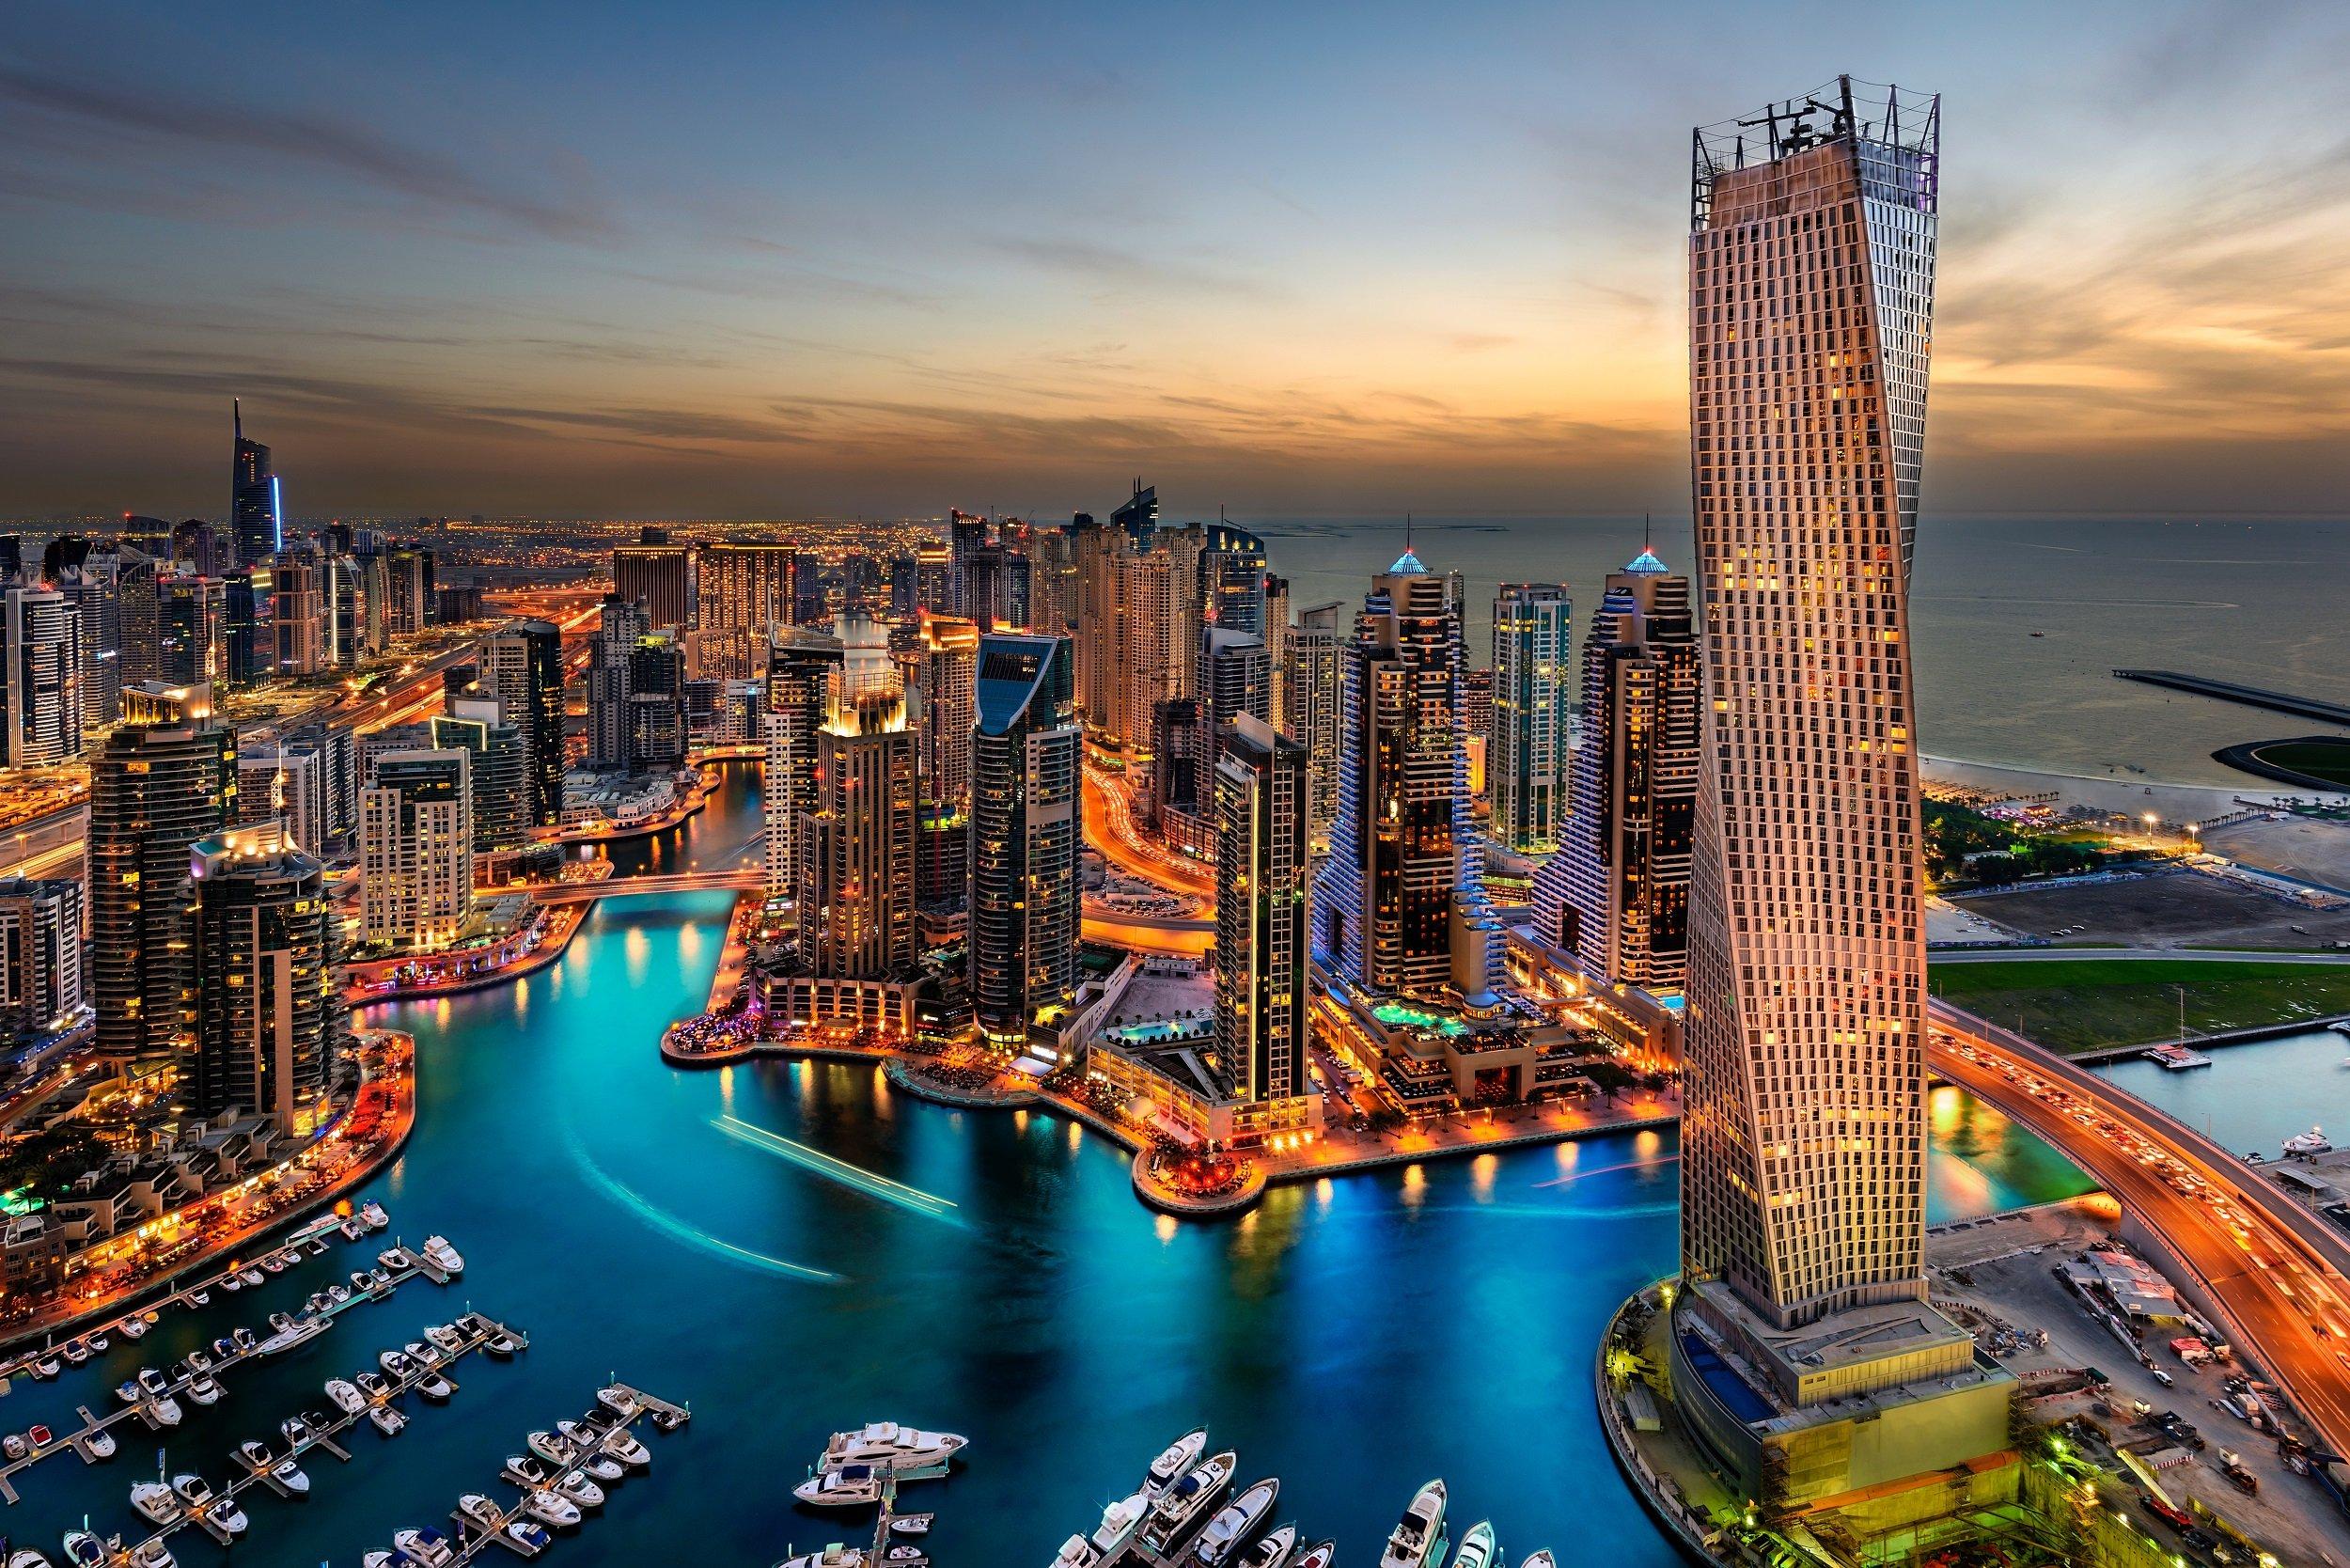 Marina Dhow Cruise Dinner From Dubai2